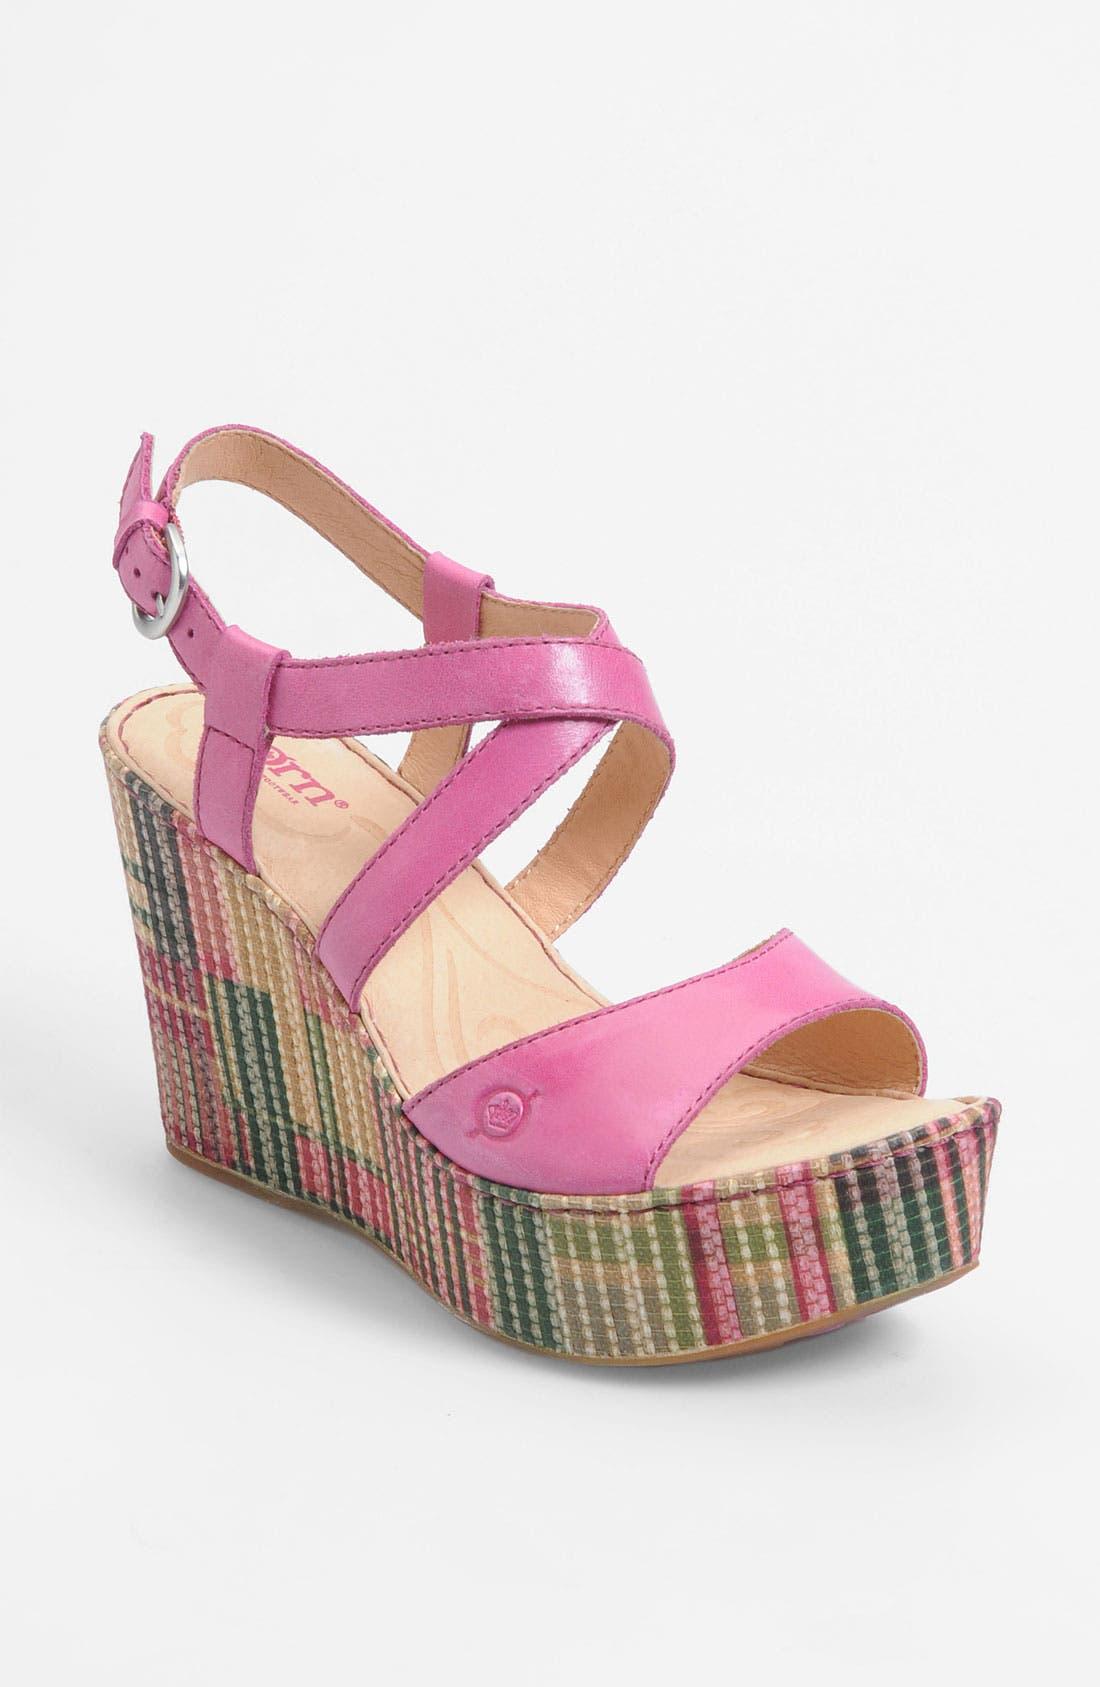 Main Image - Børn 'Caicos' Sandal